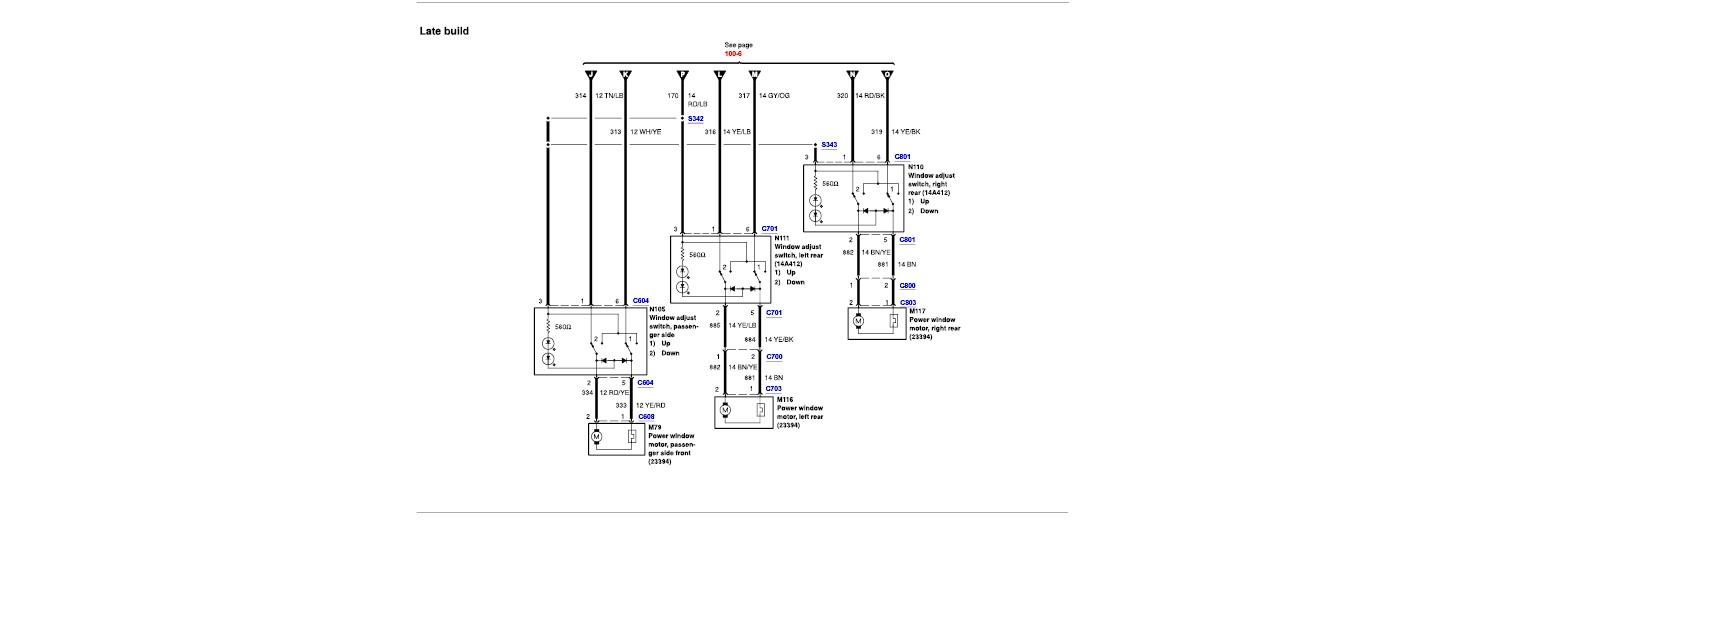 power window circuit breaker location  power  get free